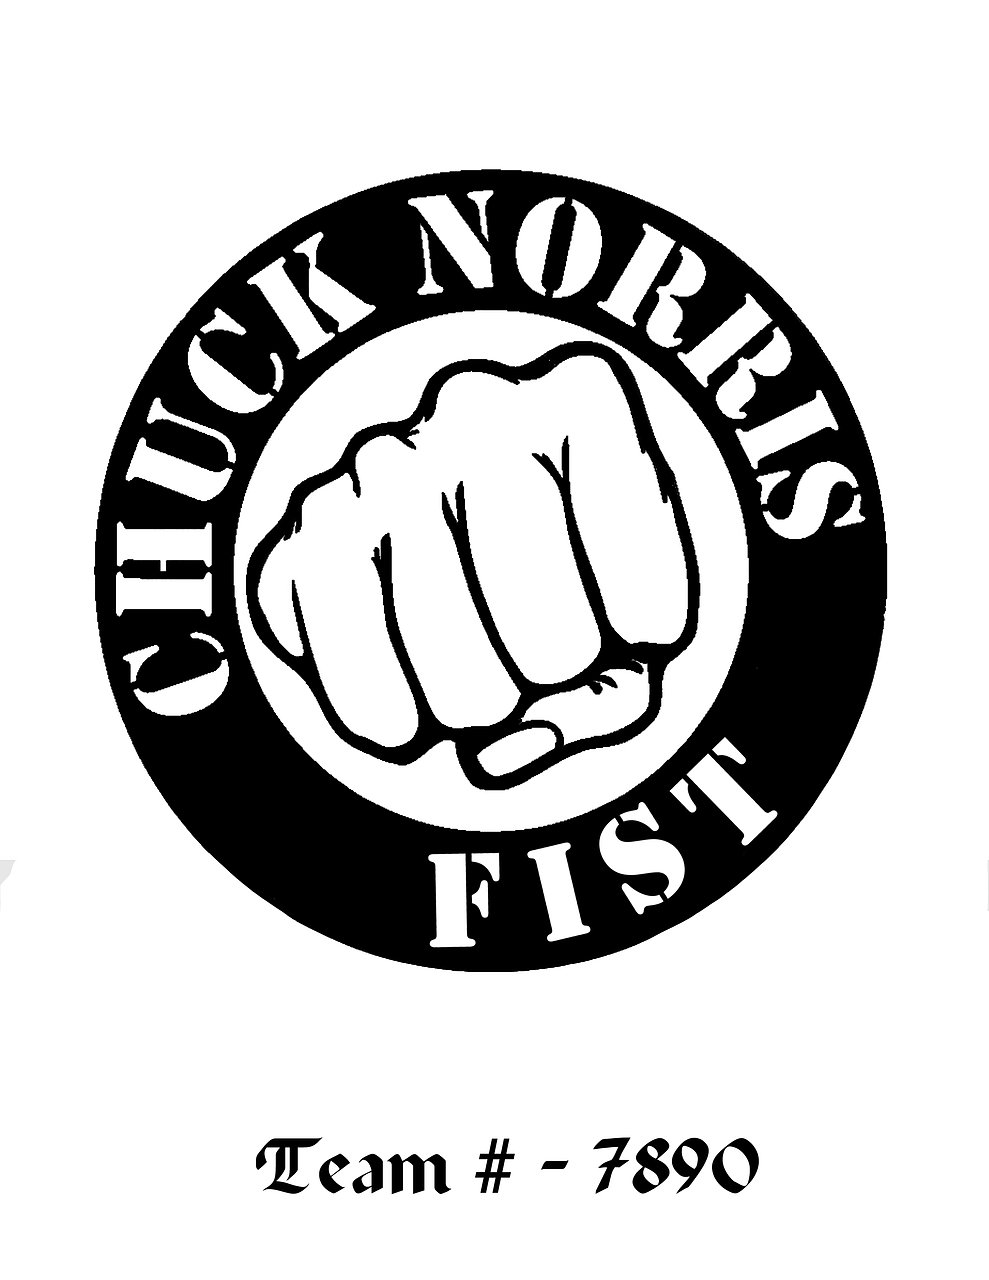 Chuck+Norris+Fist+copy.jpg